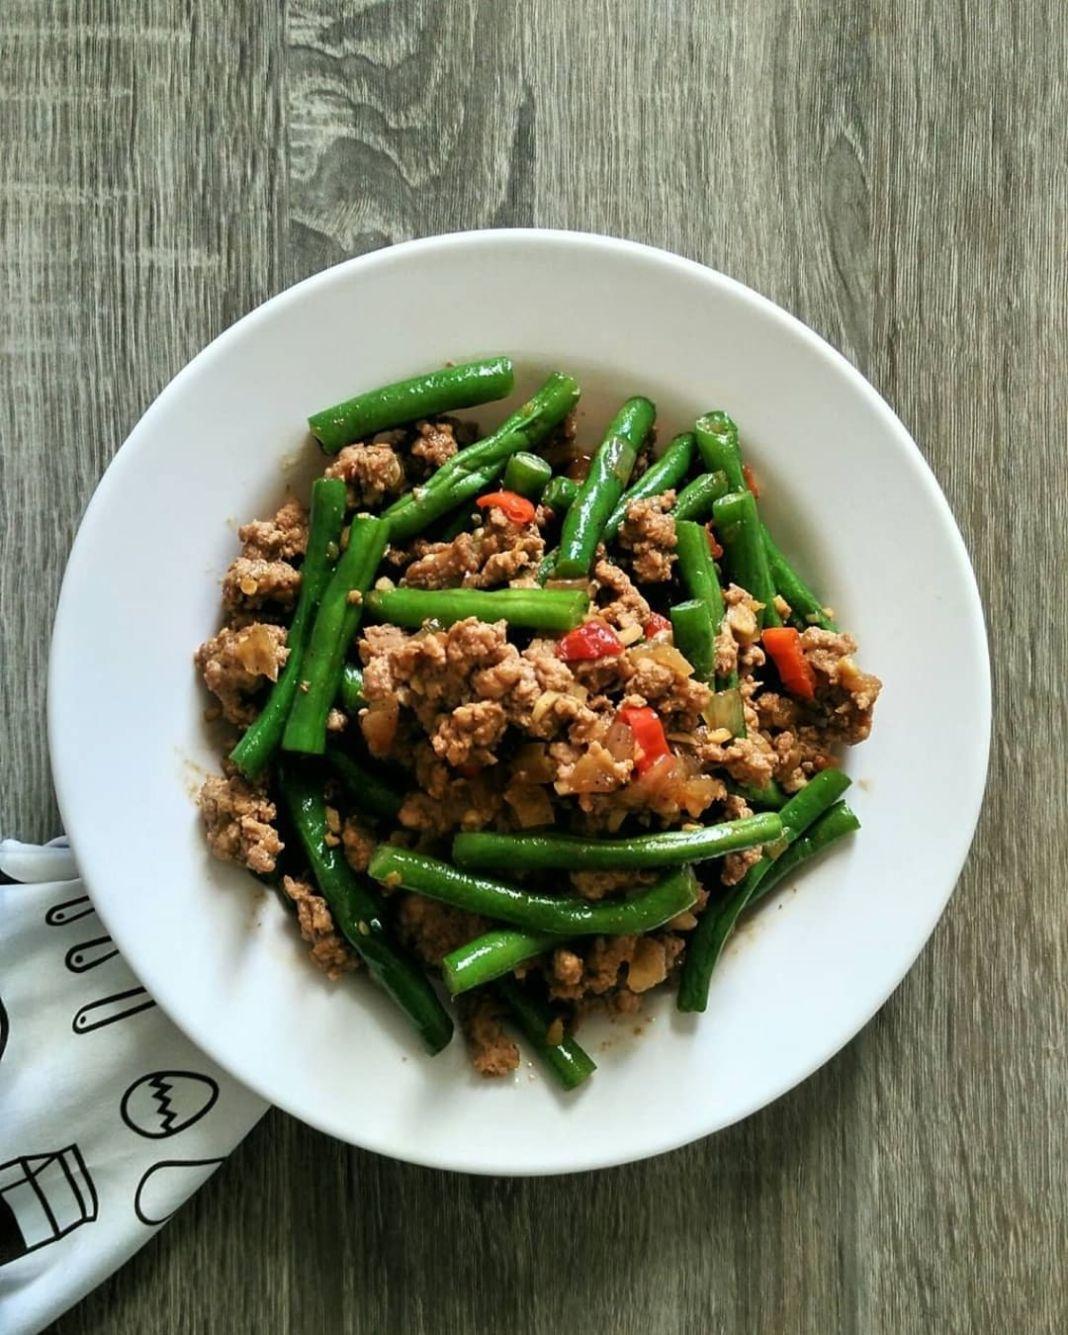 Info kuliner, TUMIS BUNCIS DAGING CINCANG (4 porsi) by : @rezitaandherkitchen  BAHAN : 1/4 kg daging sapi cin…